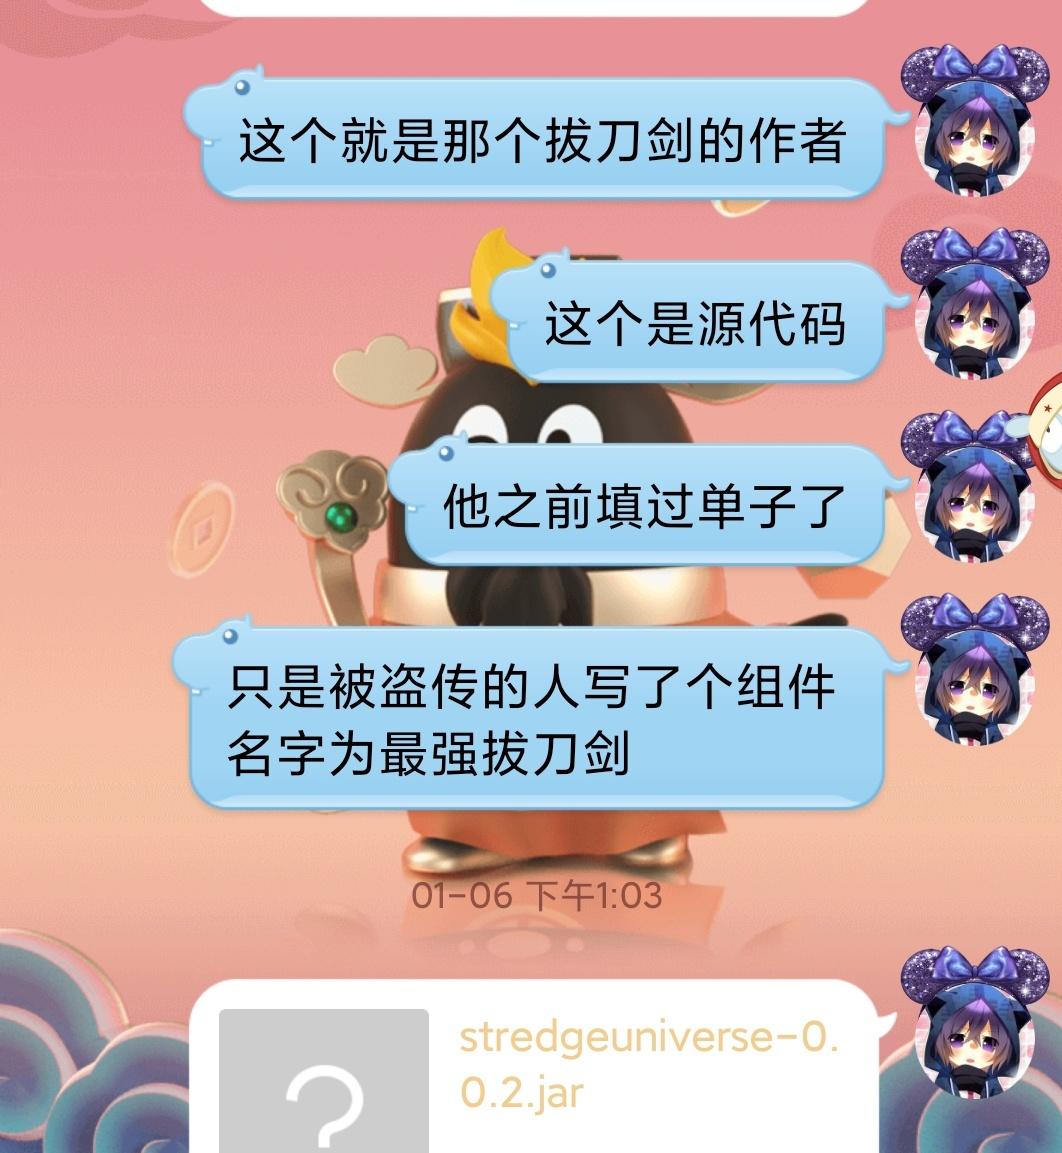 Screenshot_2020-01-25-19-25-54-769_com.tencent.mo_看图王.jpg